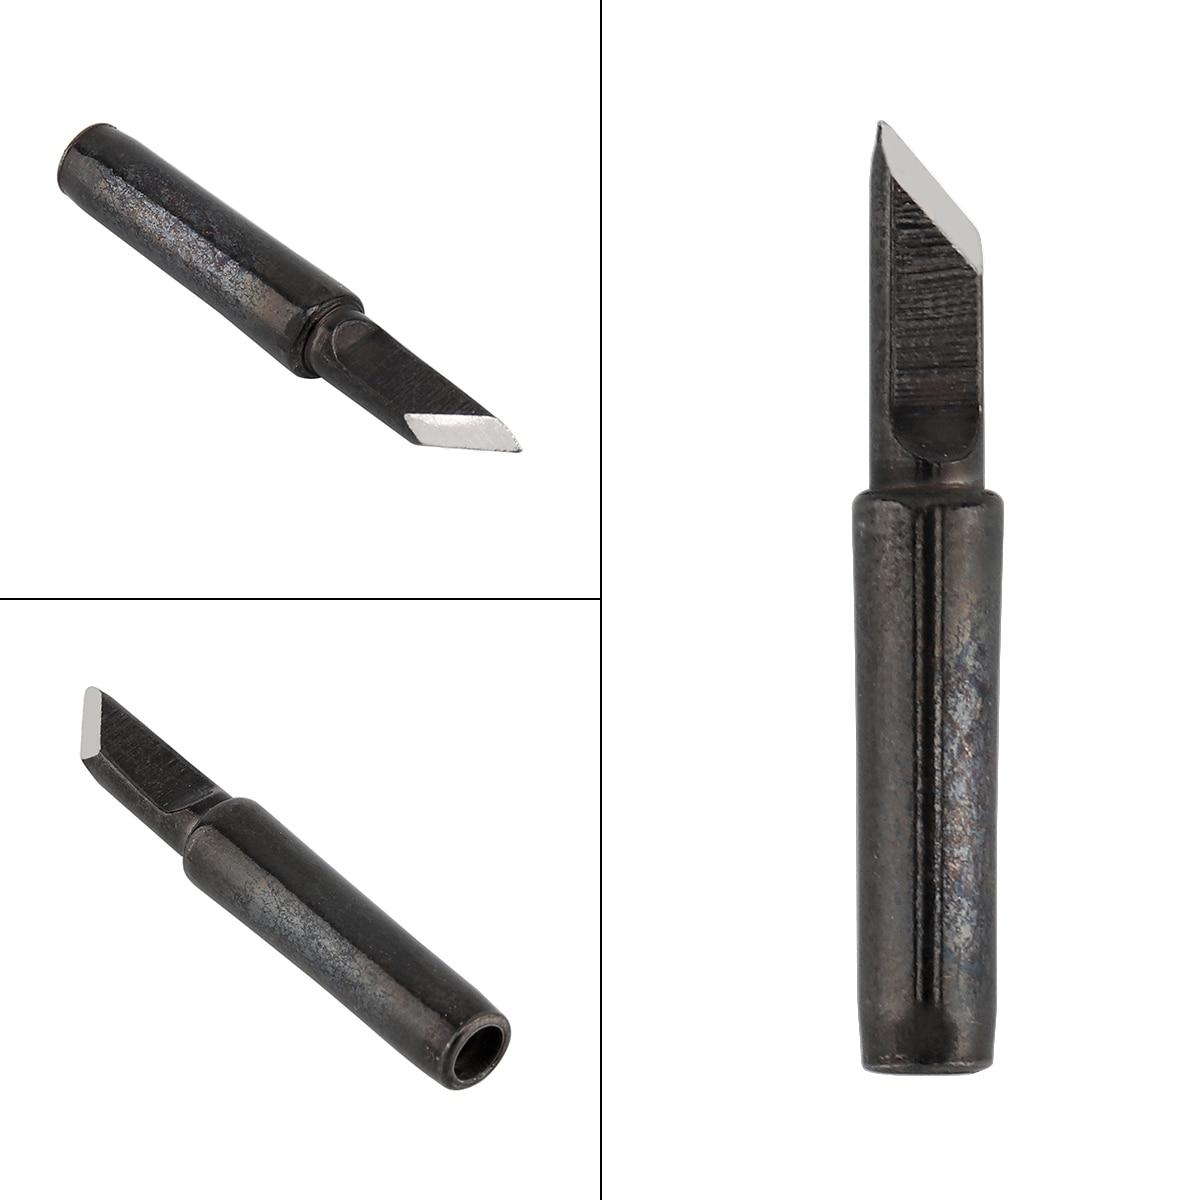 900M-T-SK Solder Tip Lead-free Black Metal Soldering Iron Tips for Hakko / 936 Soldering Rework Station